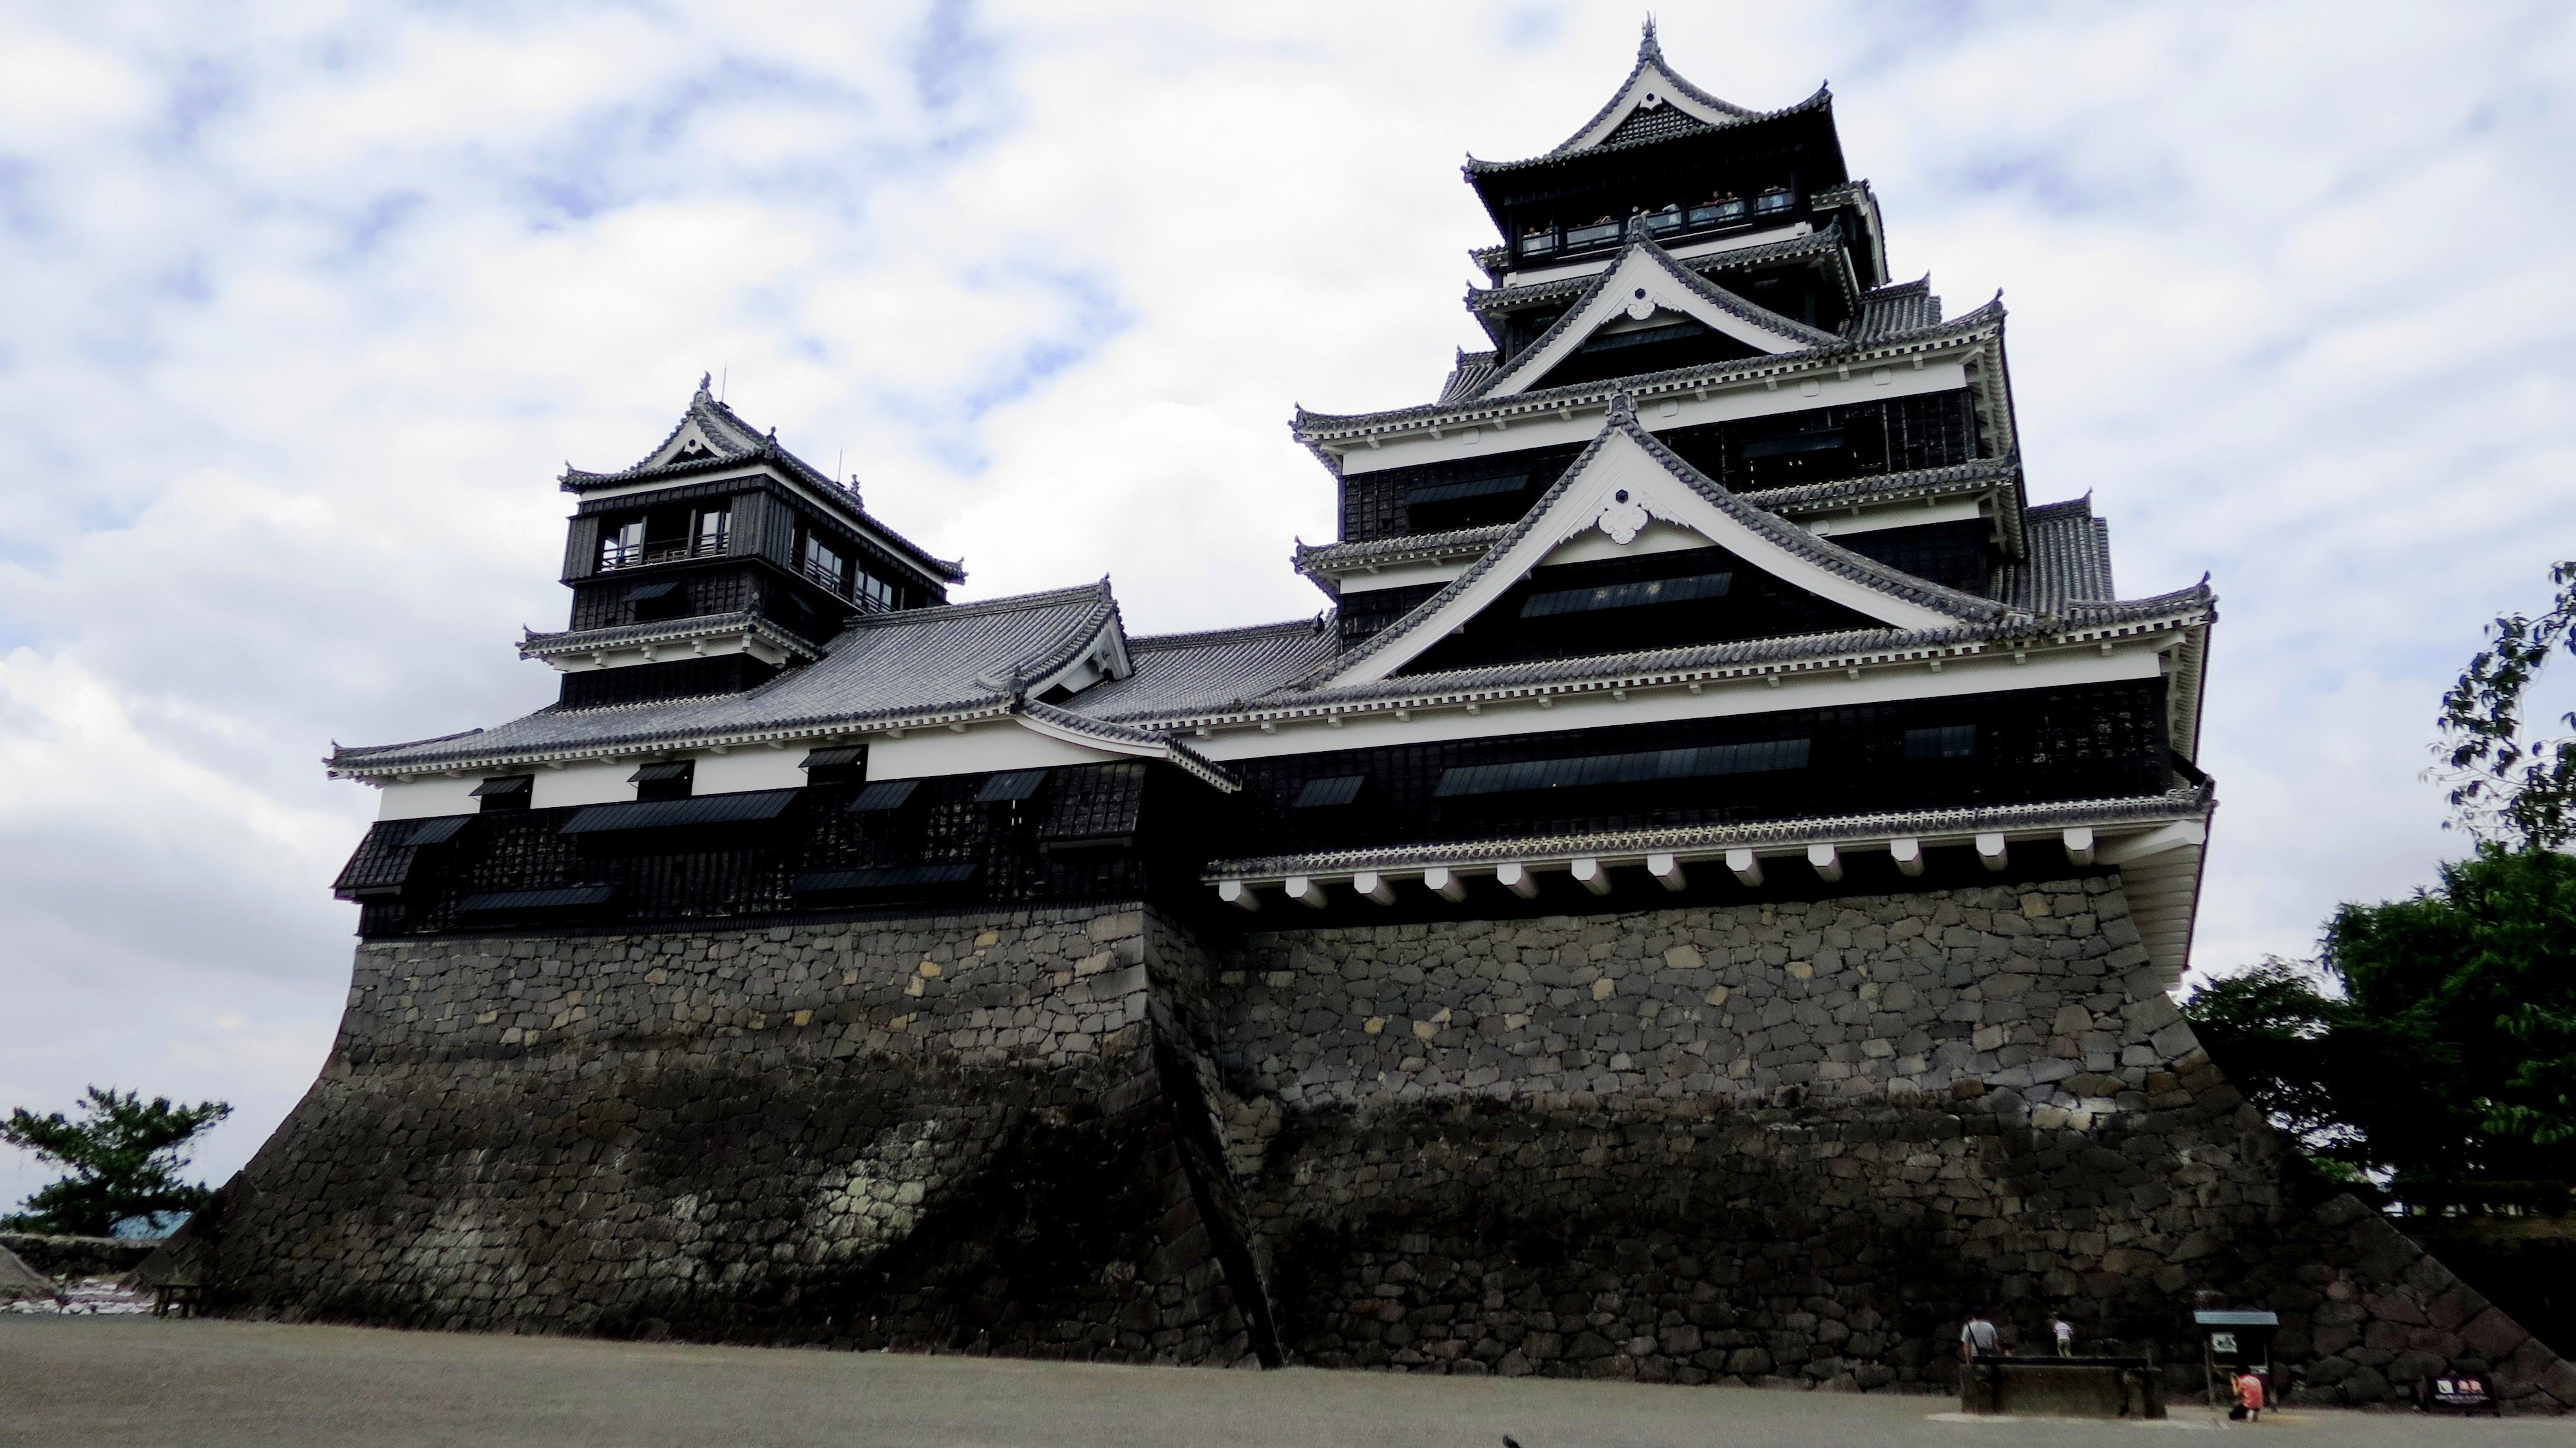 free images building old asian tower castle landmark tourism